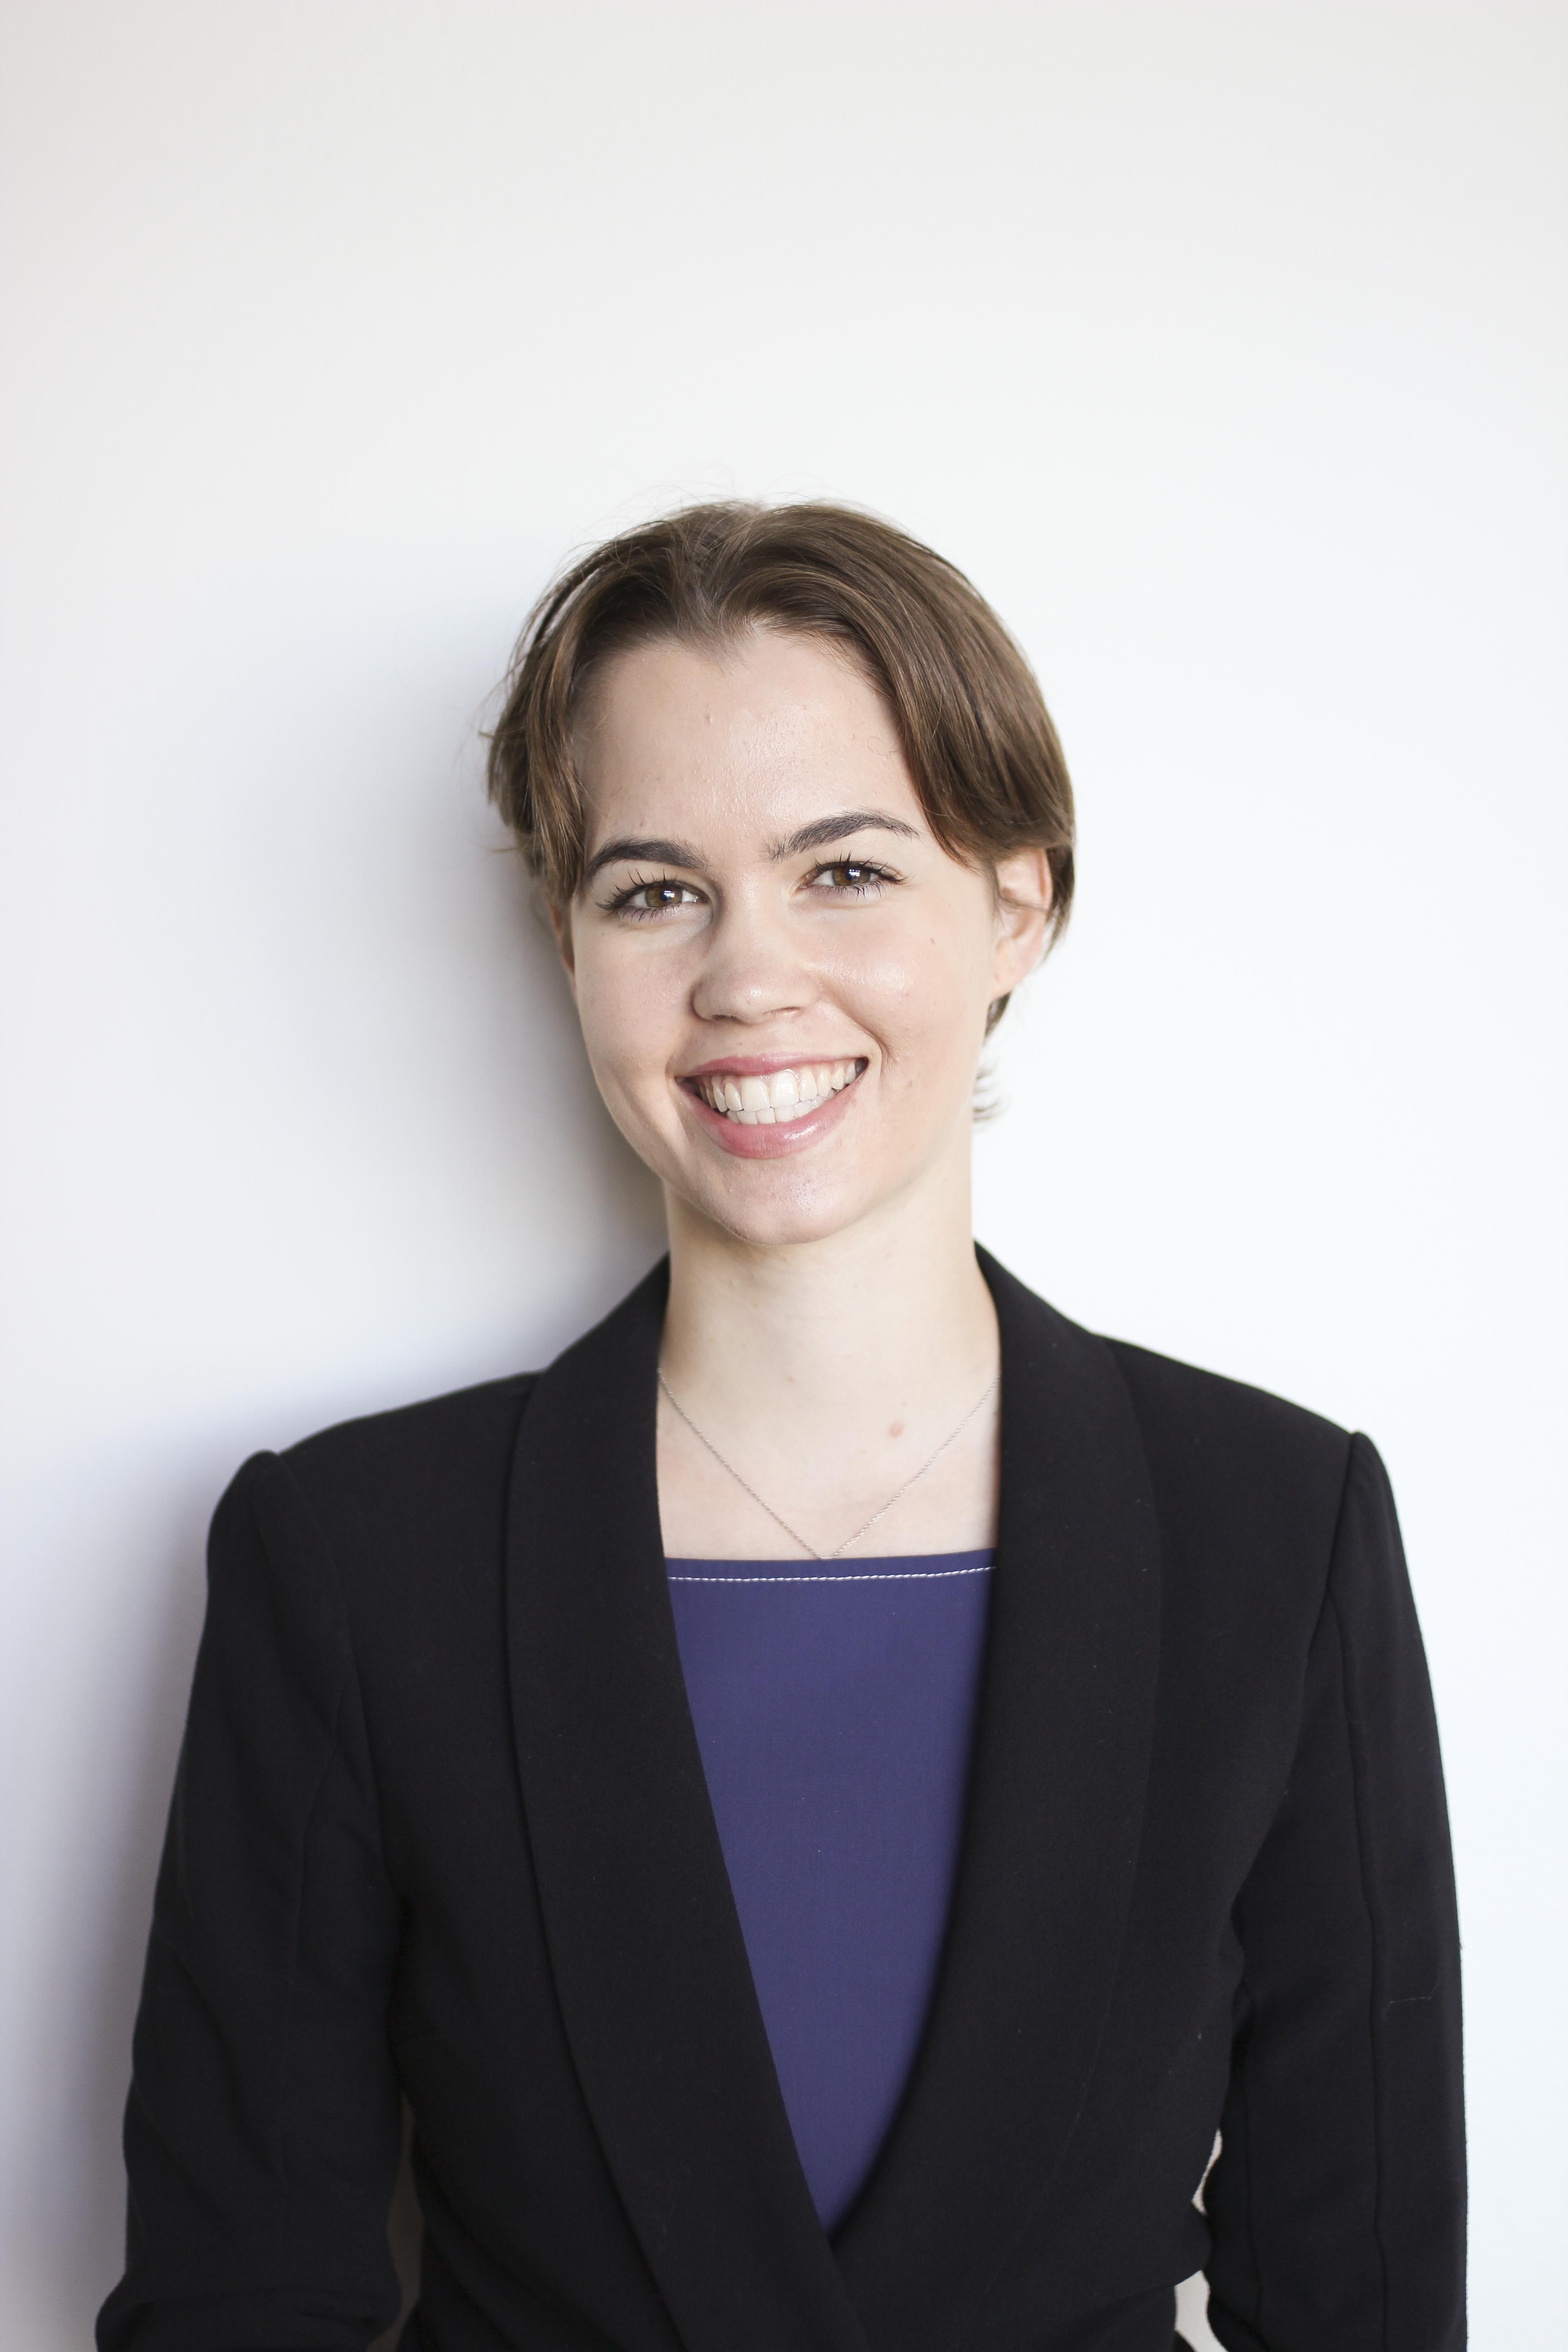 Alice Ringelstein